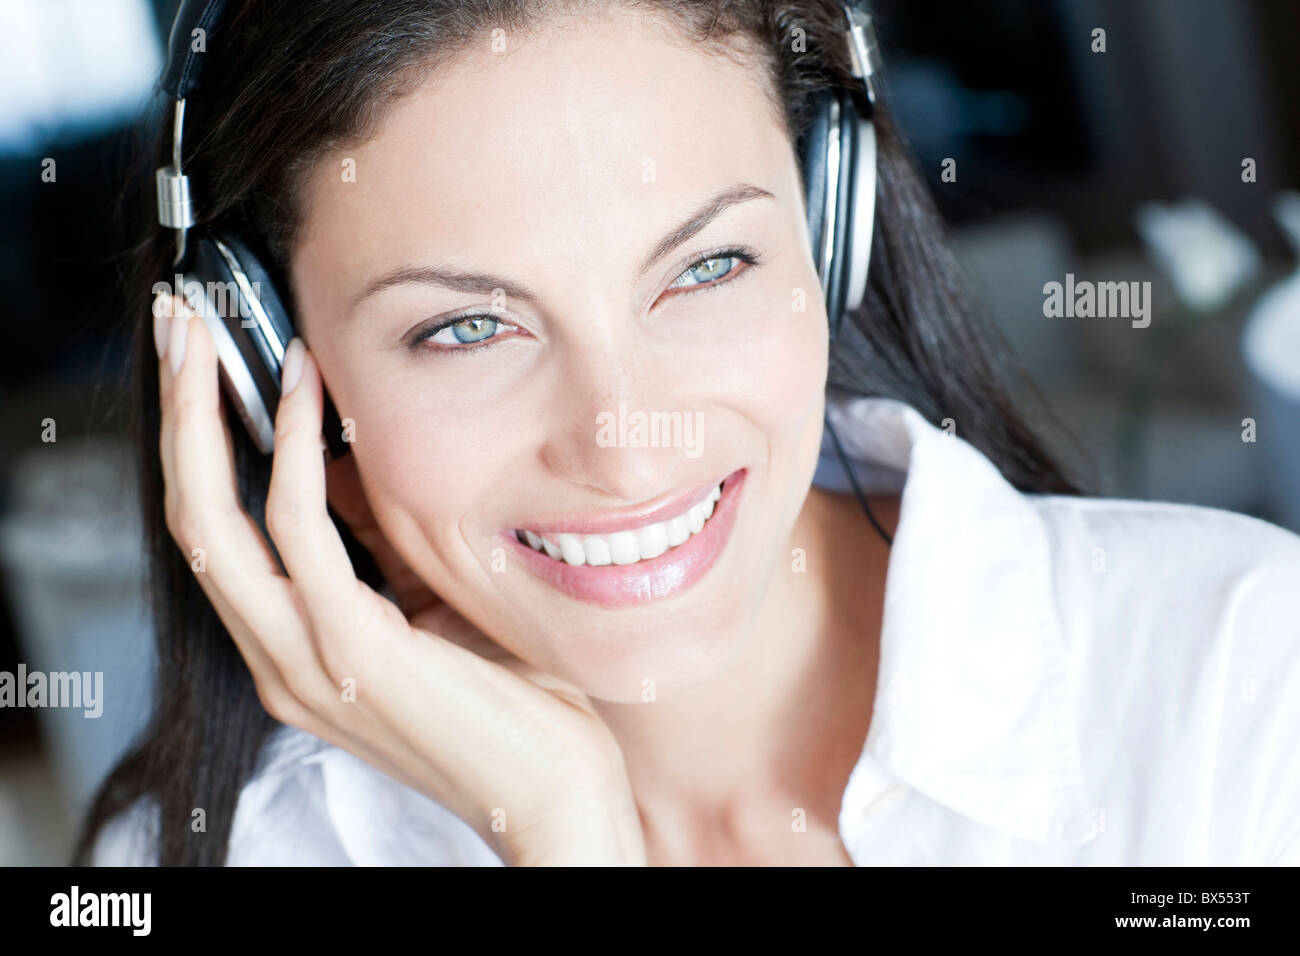 Listening to music - Stock Image